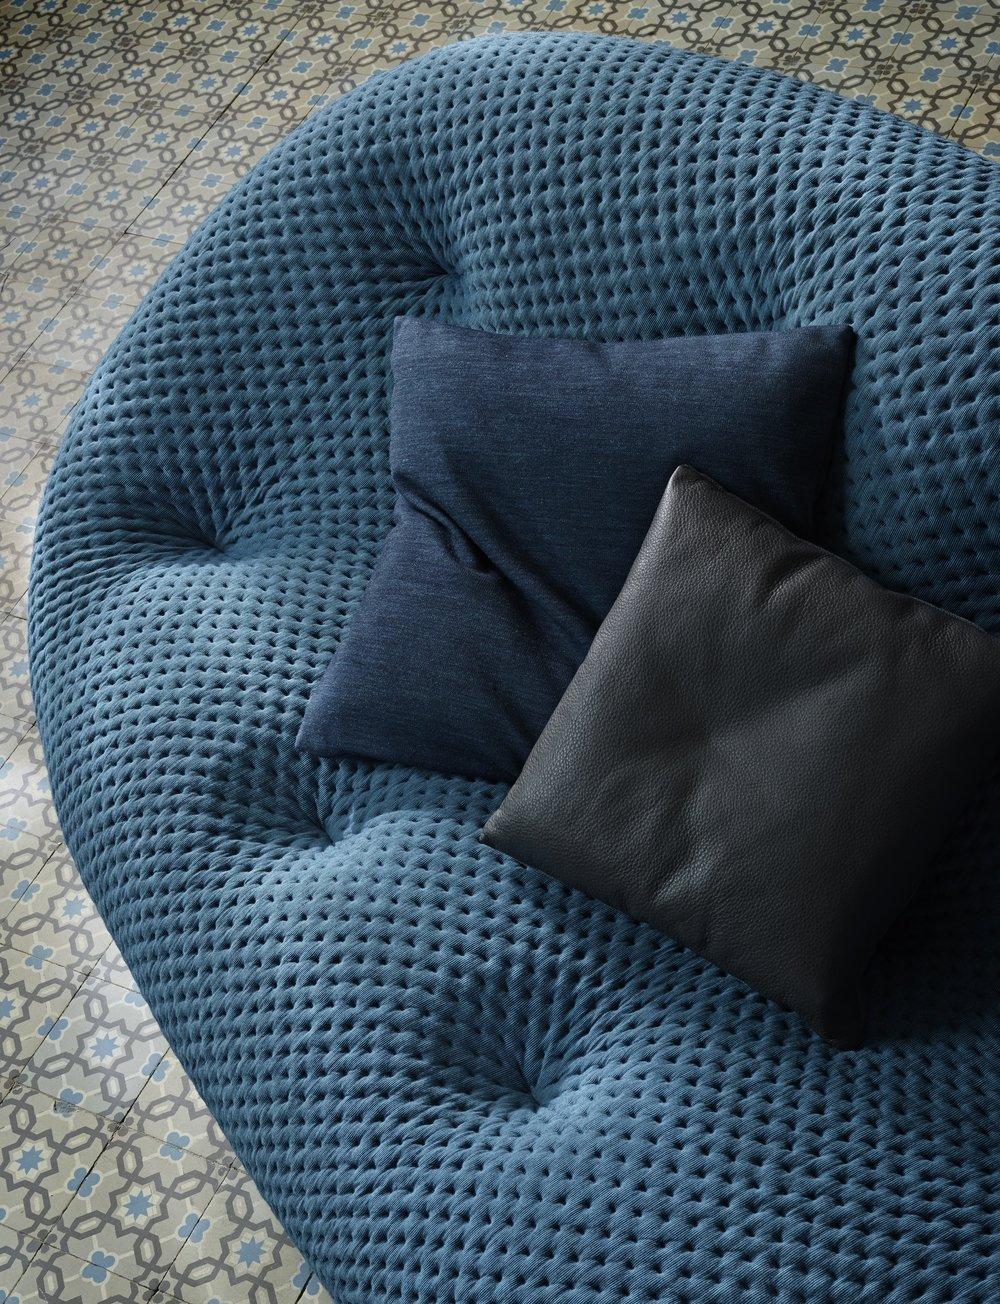 Ploum zetel sofa Ligne Roset design meubelwinkel Loncin Leuven Hasselt mechelen Sint-truiden Brussels Bruxelles Anwterpen Gent 1.jpg